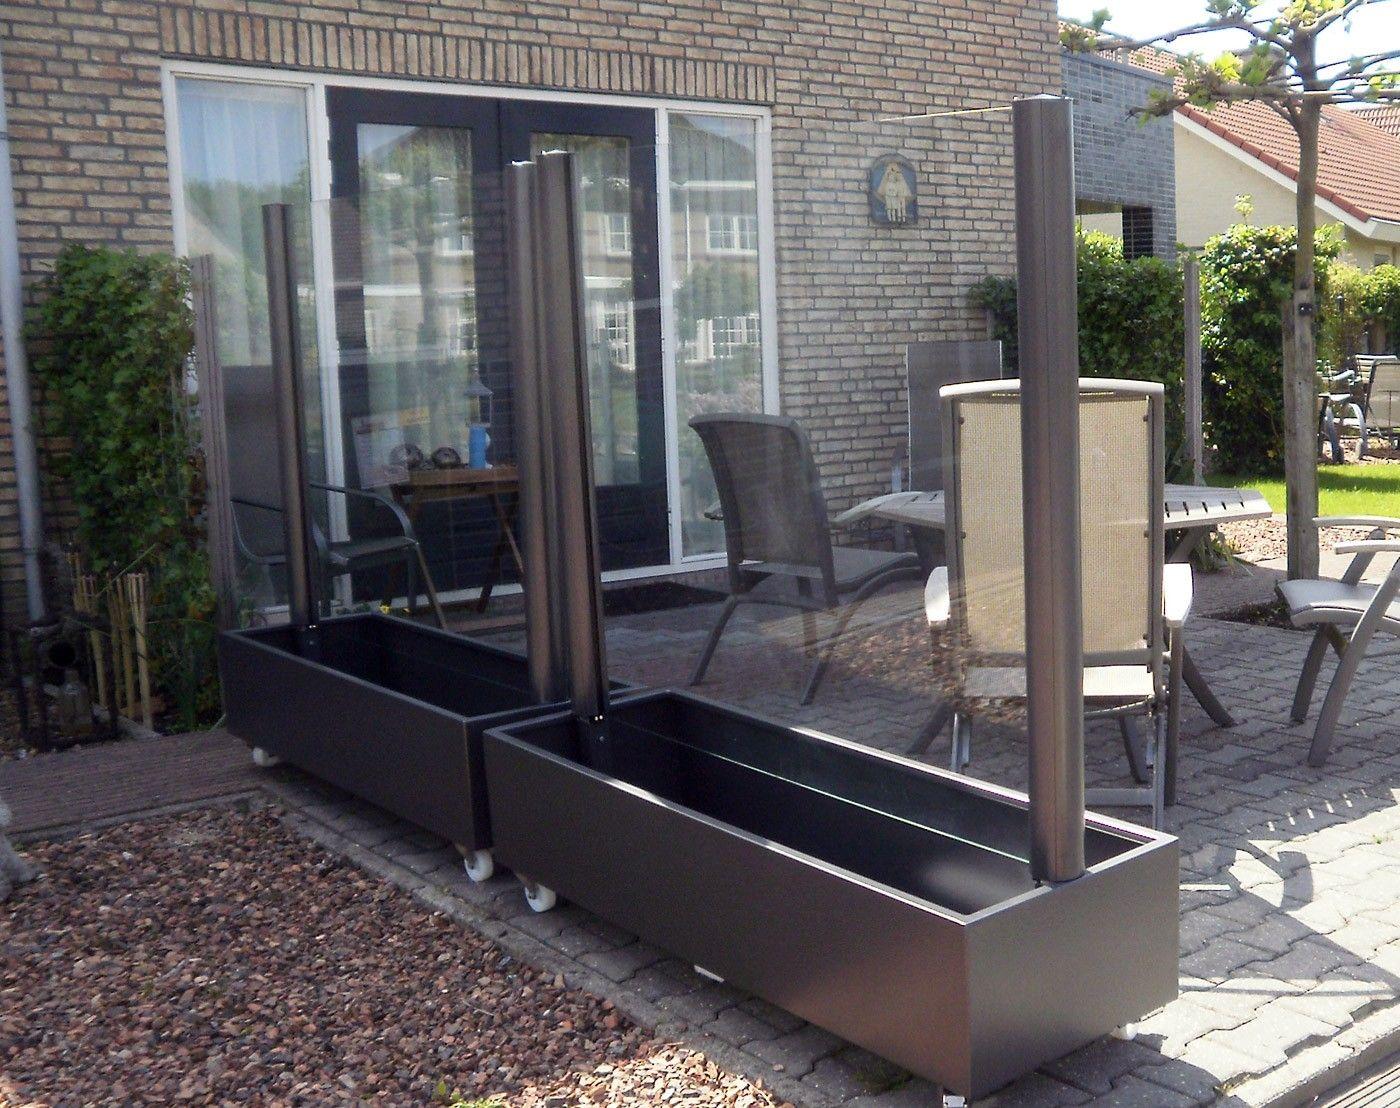 Plexiglas Windscherm Tuin : Mobiel windscherm flower line tuin in tuin tuin meubelen